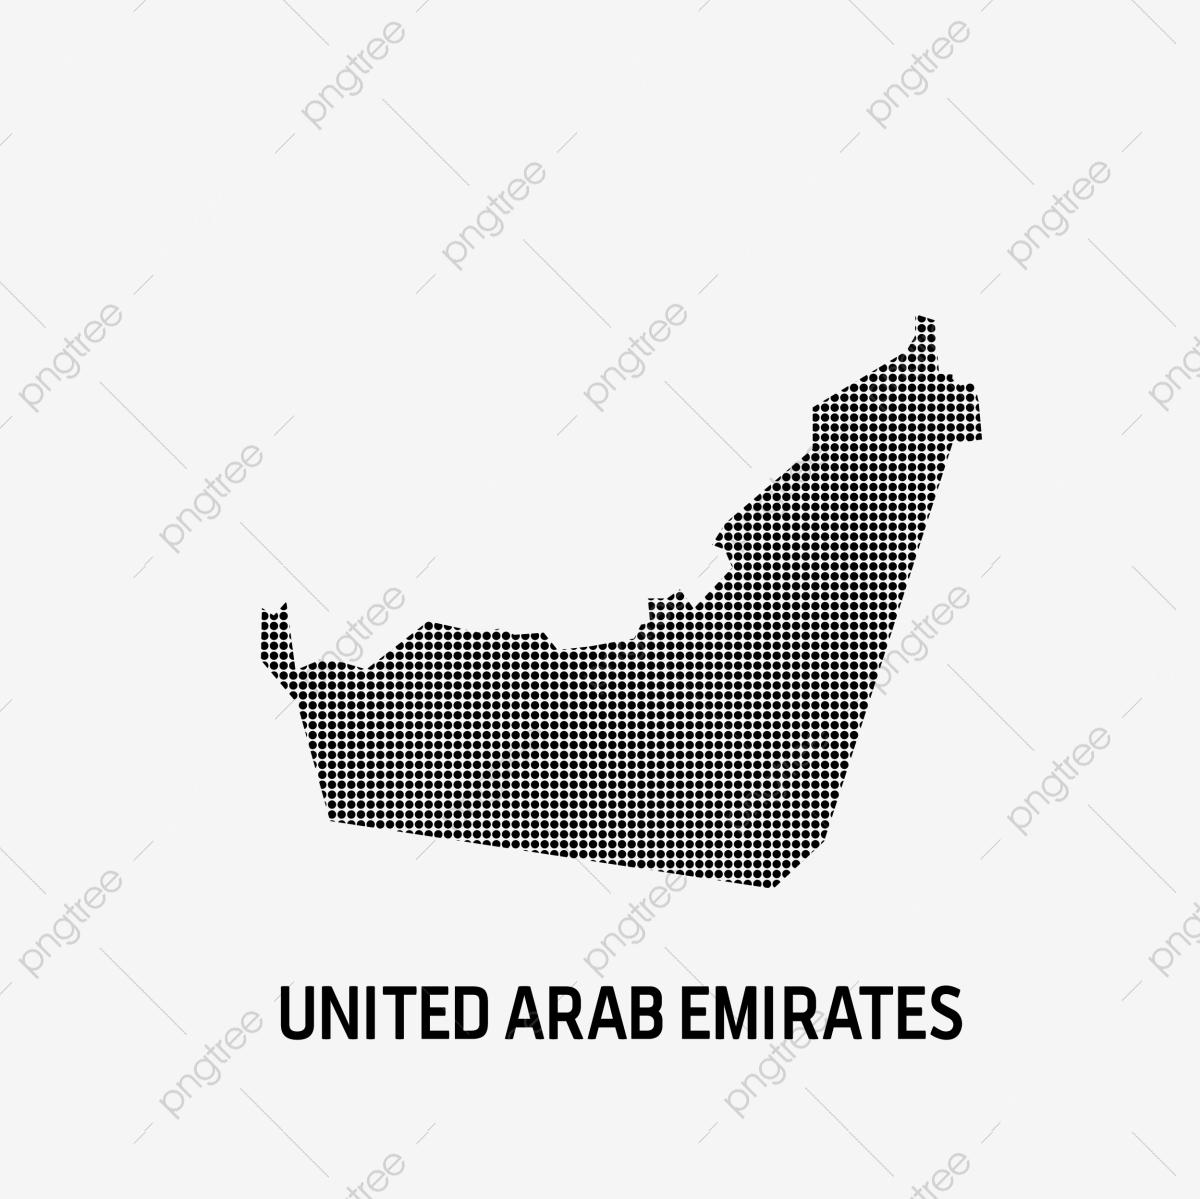 United Arab Emirates Map, United Arab Emirates, Arab, Dubai ... on morocco map, sudan map, qatar map, emirates map, syria map, iraq map, yemen map, turkey map, israel map, maldives map, western sahara map, east timor map, philippines map, kabul map, cyprus map, united college map, sri lanka map, baghdad map, bahrain map, lebanon map,